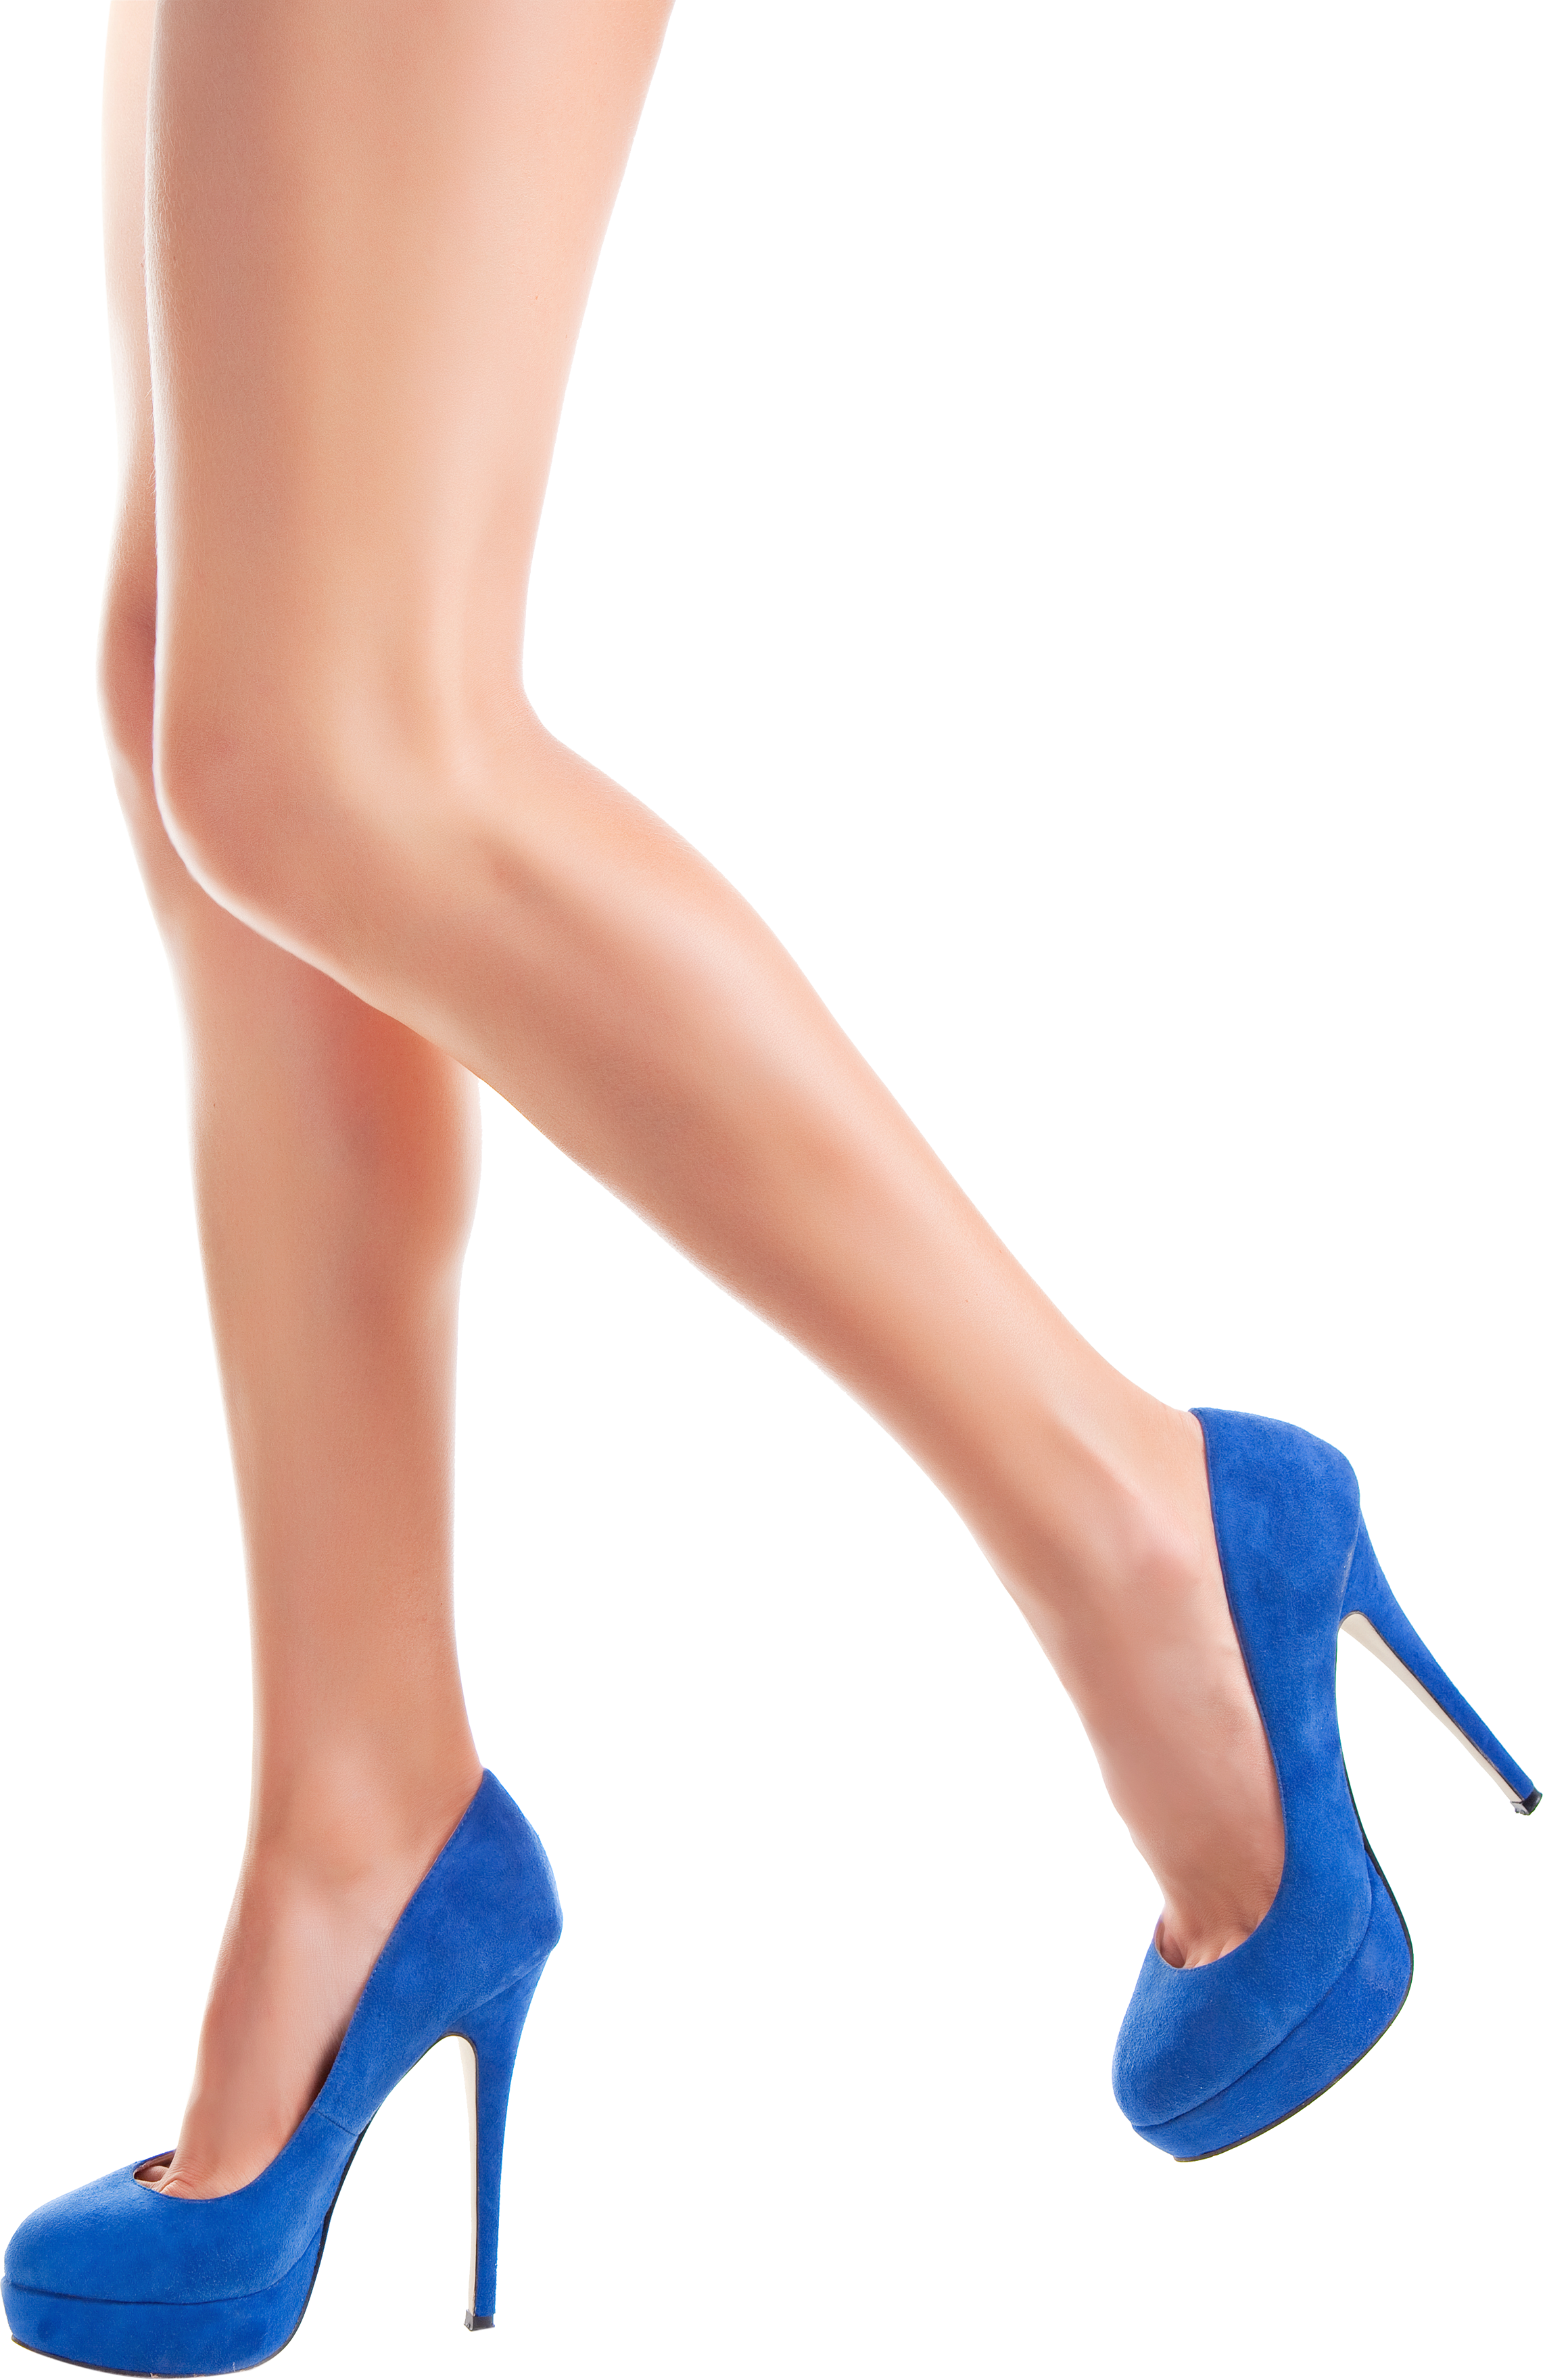 Turkey legs clipart jpg royalty free stock Leg clipart transparent background jpg royalty free stock